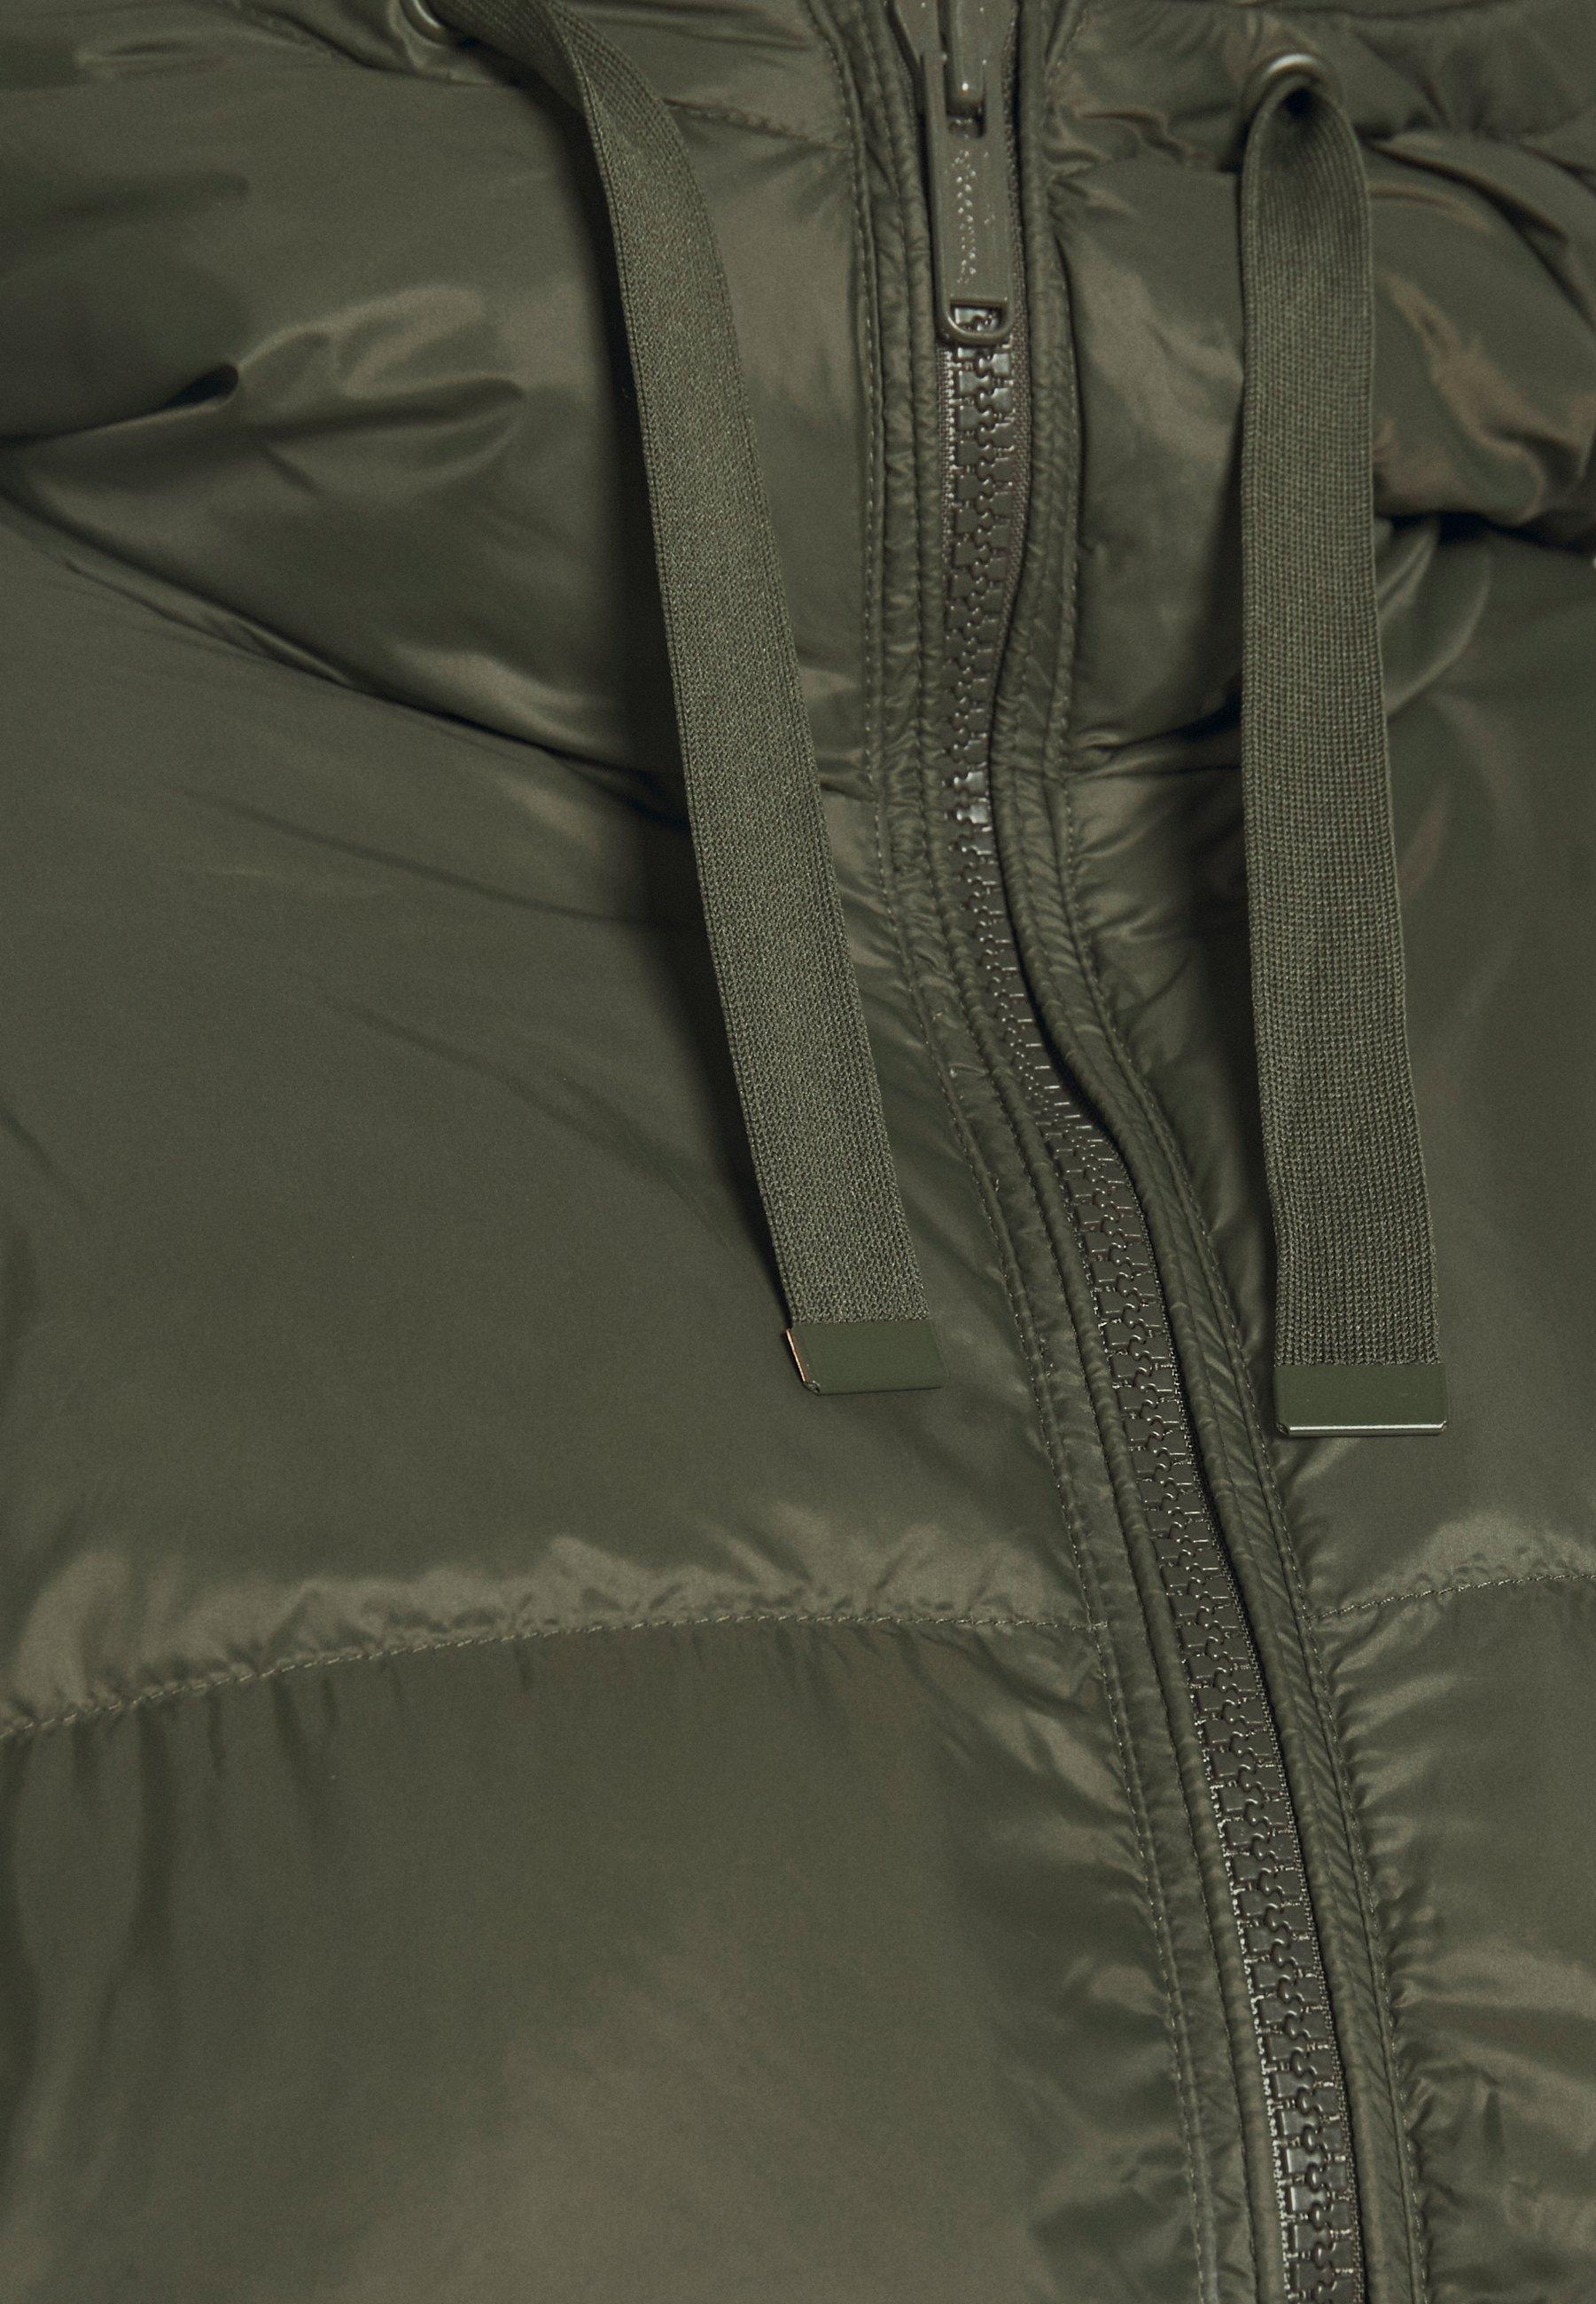 New And Fashion 100% Guaranteed Women's Clothing Bomboogie Down coat forest night LkOPxNB8q glVOzjwxc